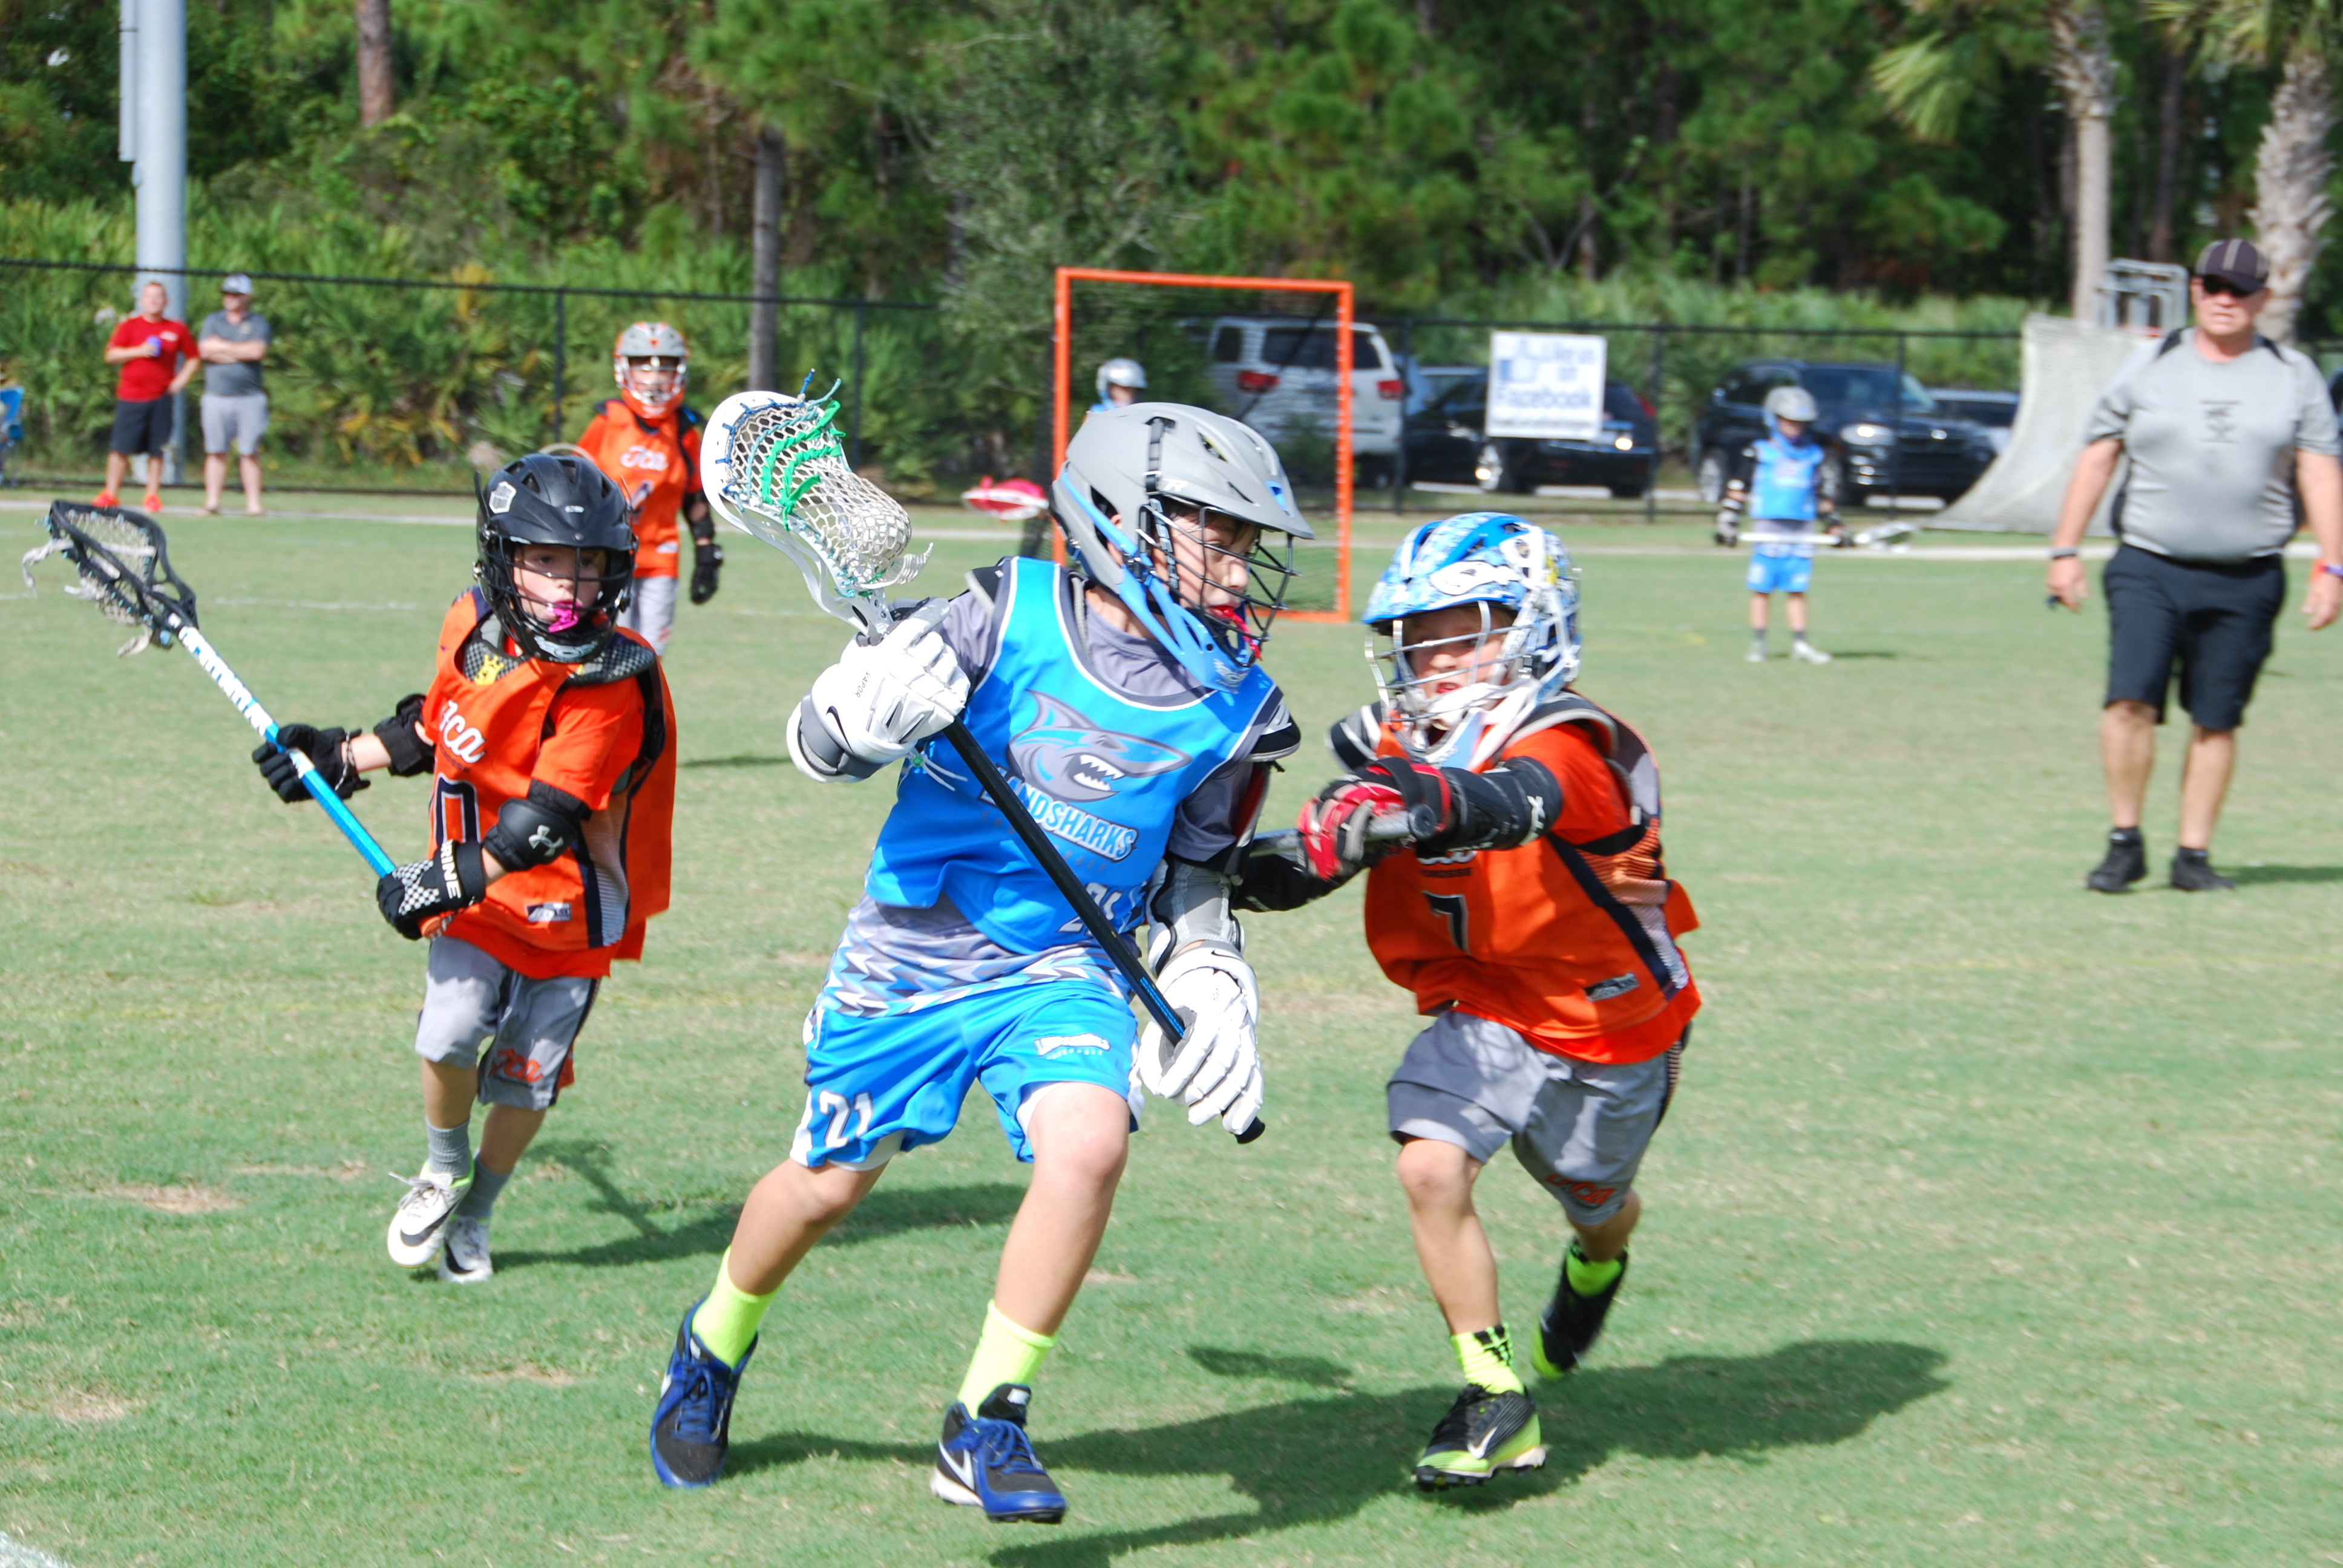 lauderdale-lacrosse-landsharks (19)